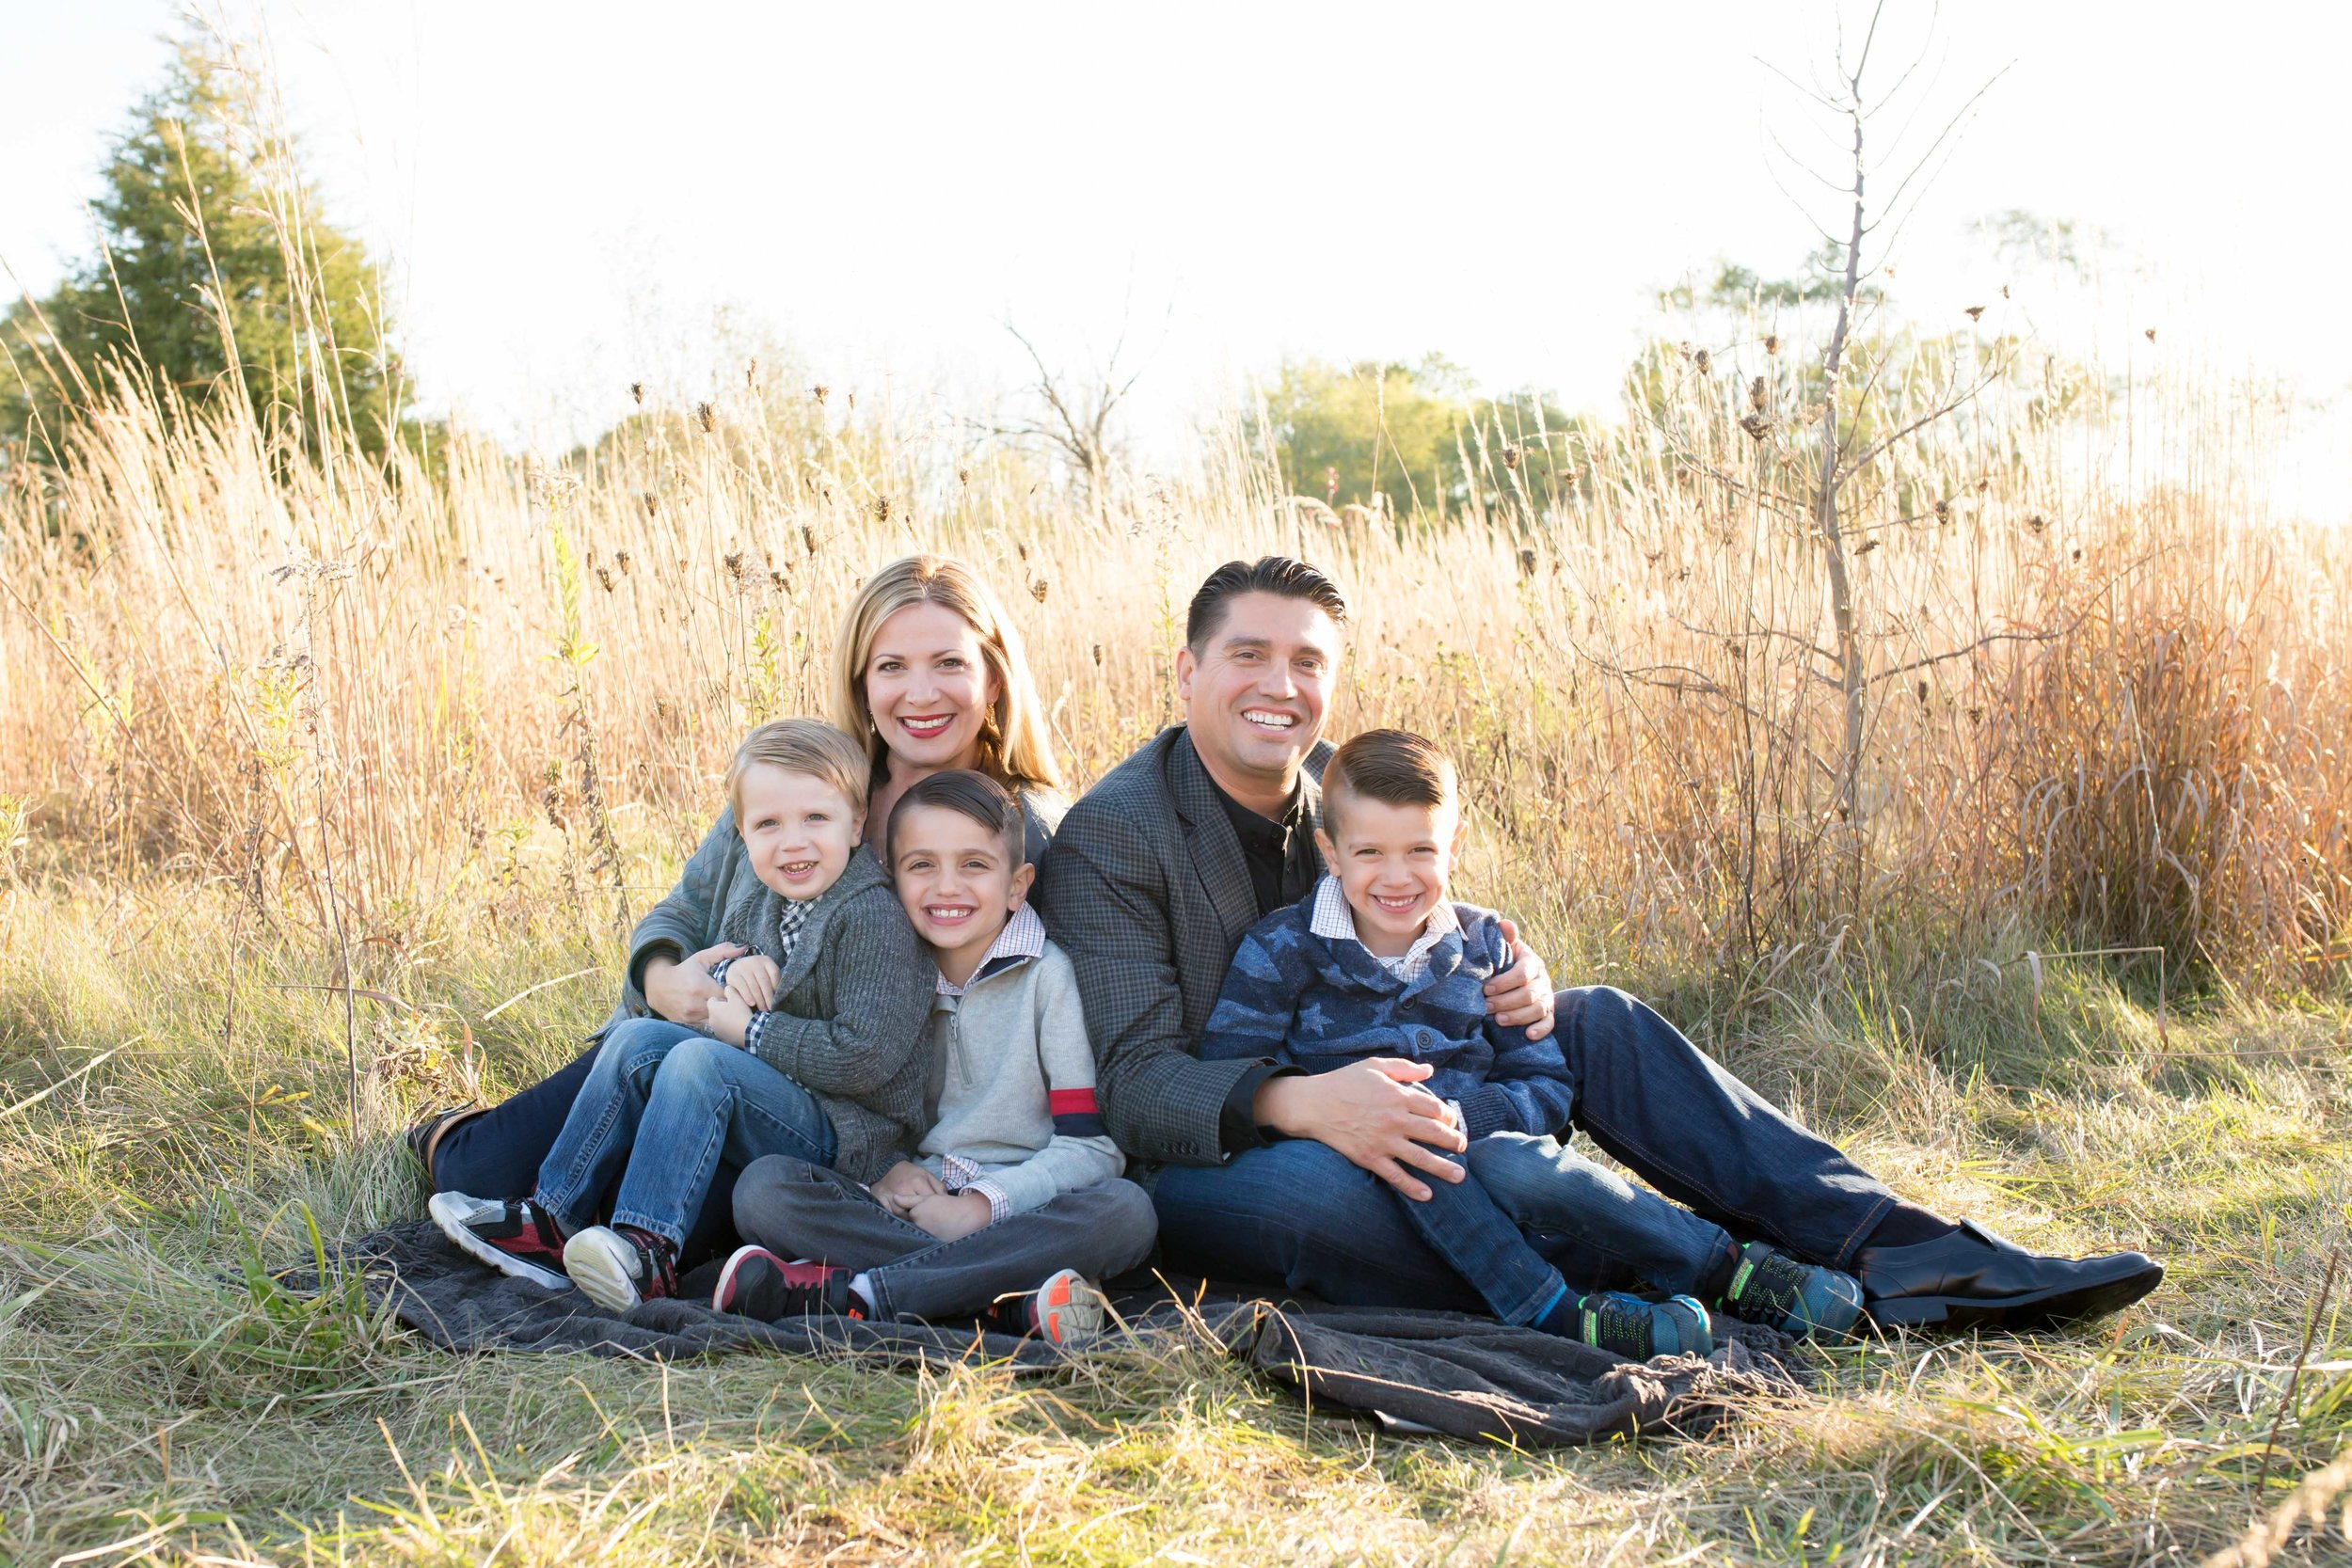 Wheatonfamilyminisession-2.jpg